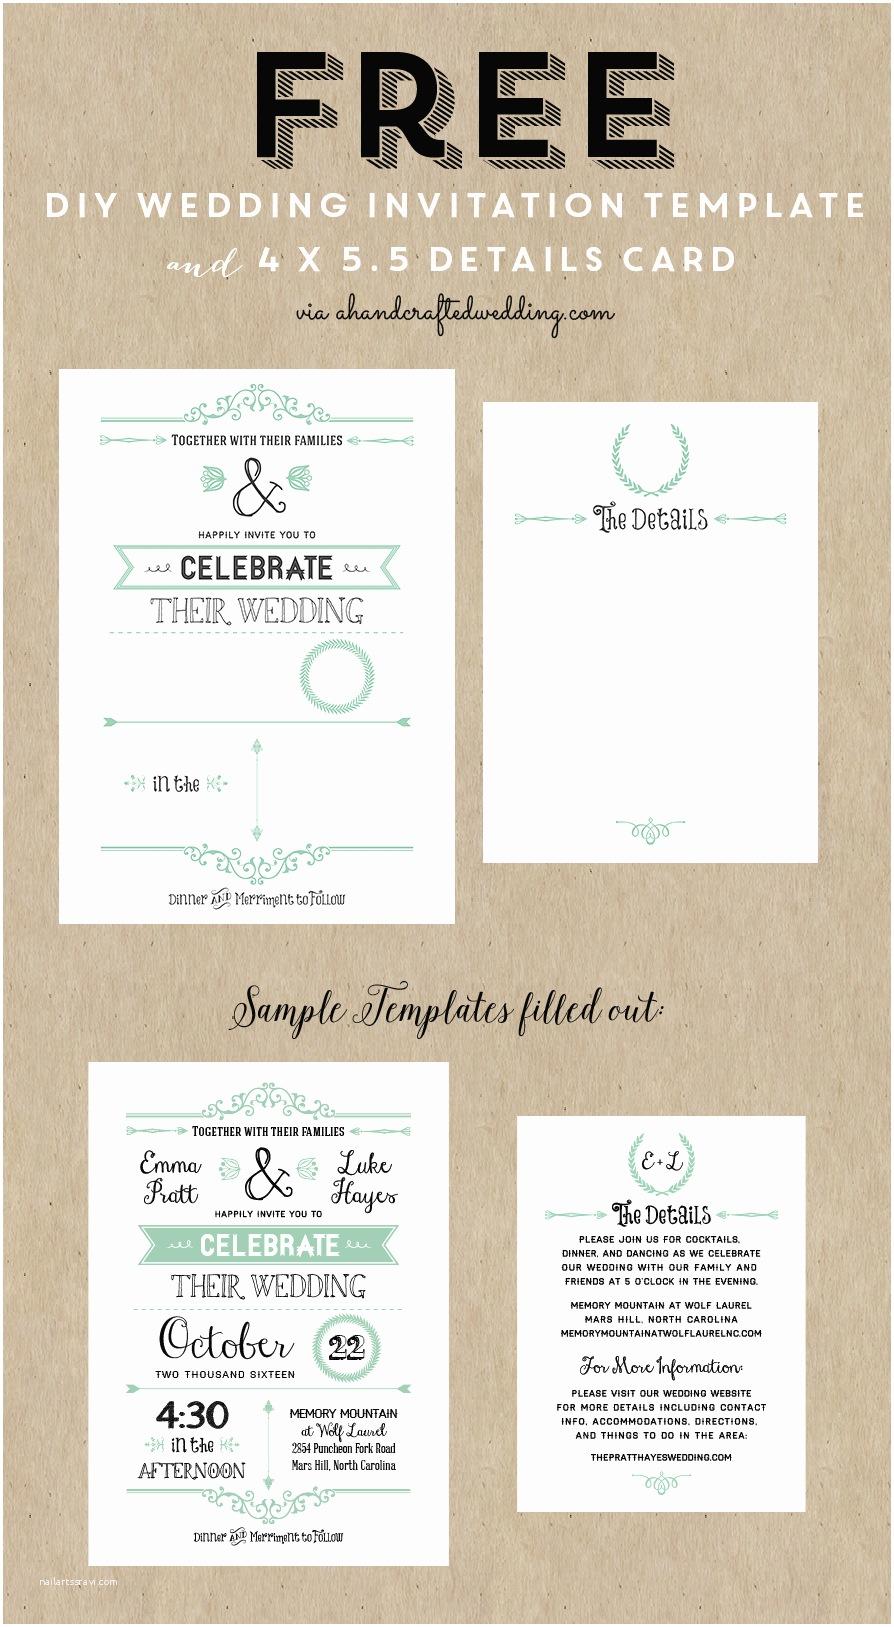 Free Rustic Wedding Invitation Templates Free Rustic Wedding Invitation Templates